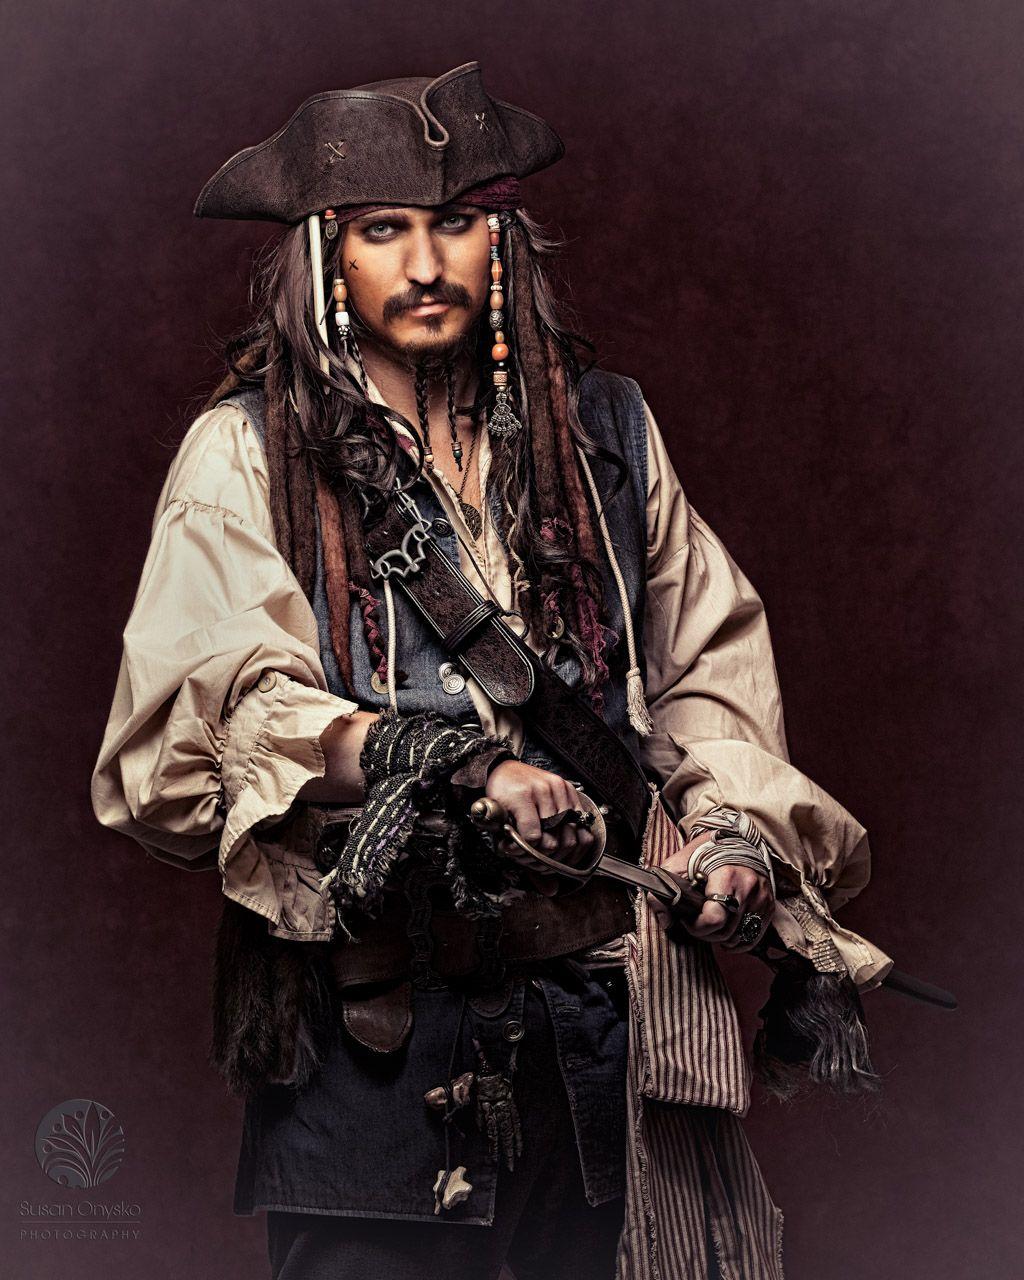 Jack Sparrow Cosplay Susan Onysko Photography Jack Sparrow Cosplay Jack Sparrow Captain Jack Sparrow